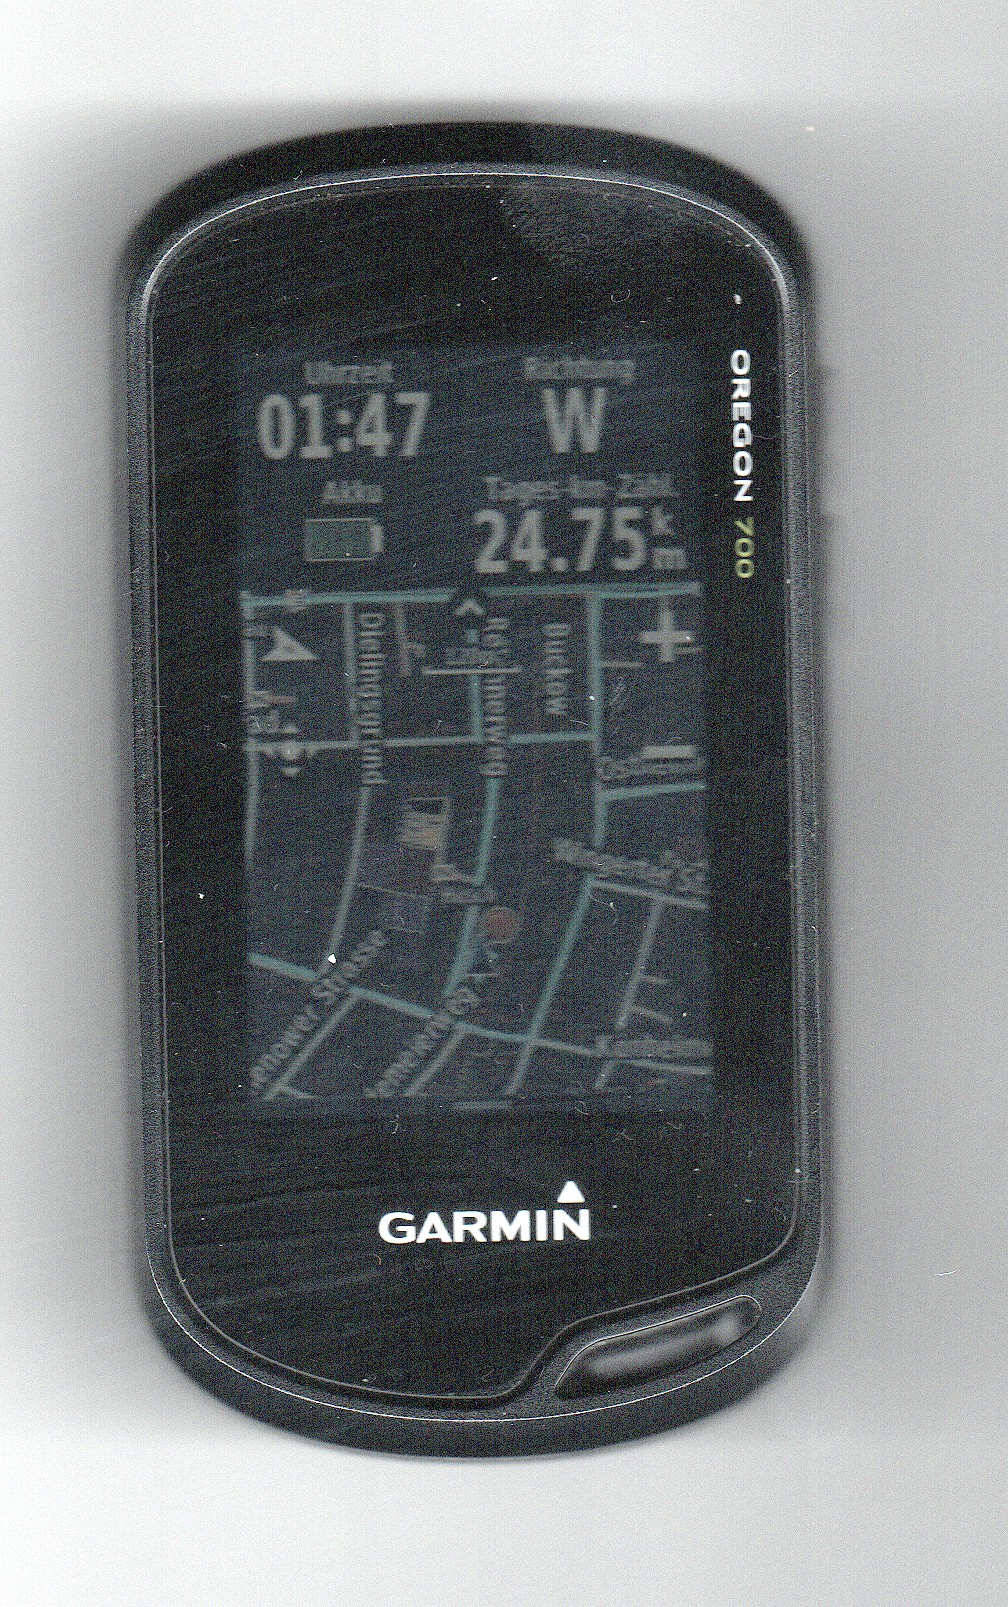 Garmin Oregon 700